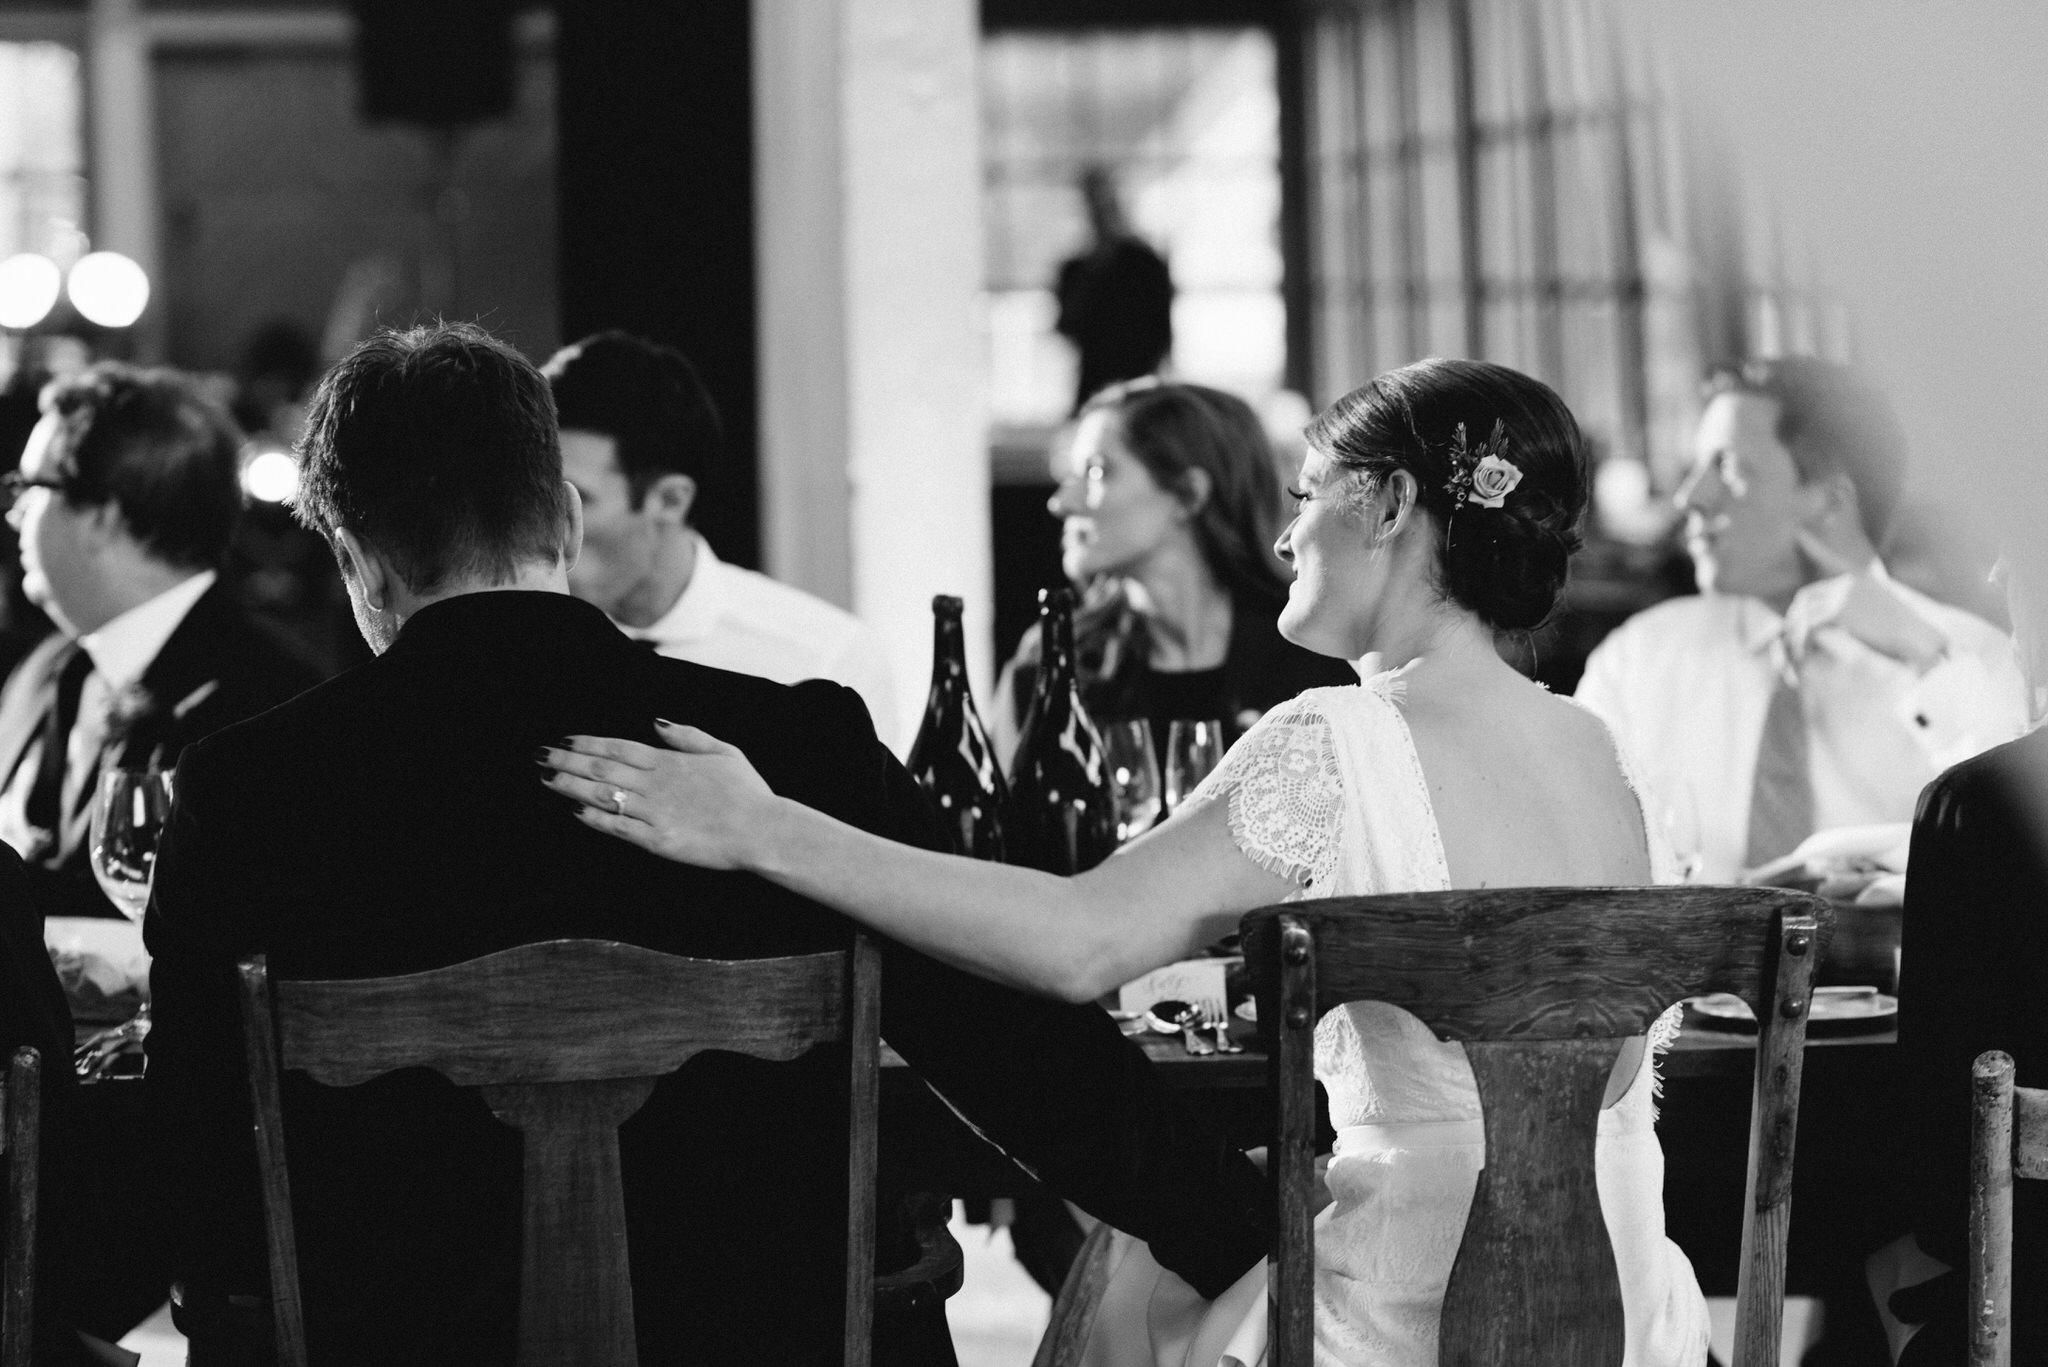 scarletoneillphotography_weddingphotography_prince edward county weddings155.JPG